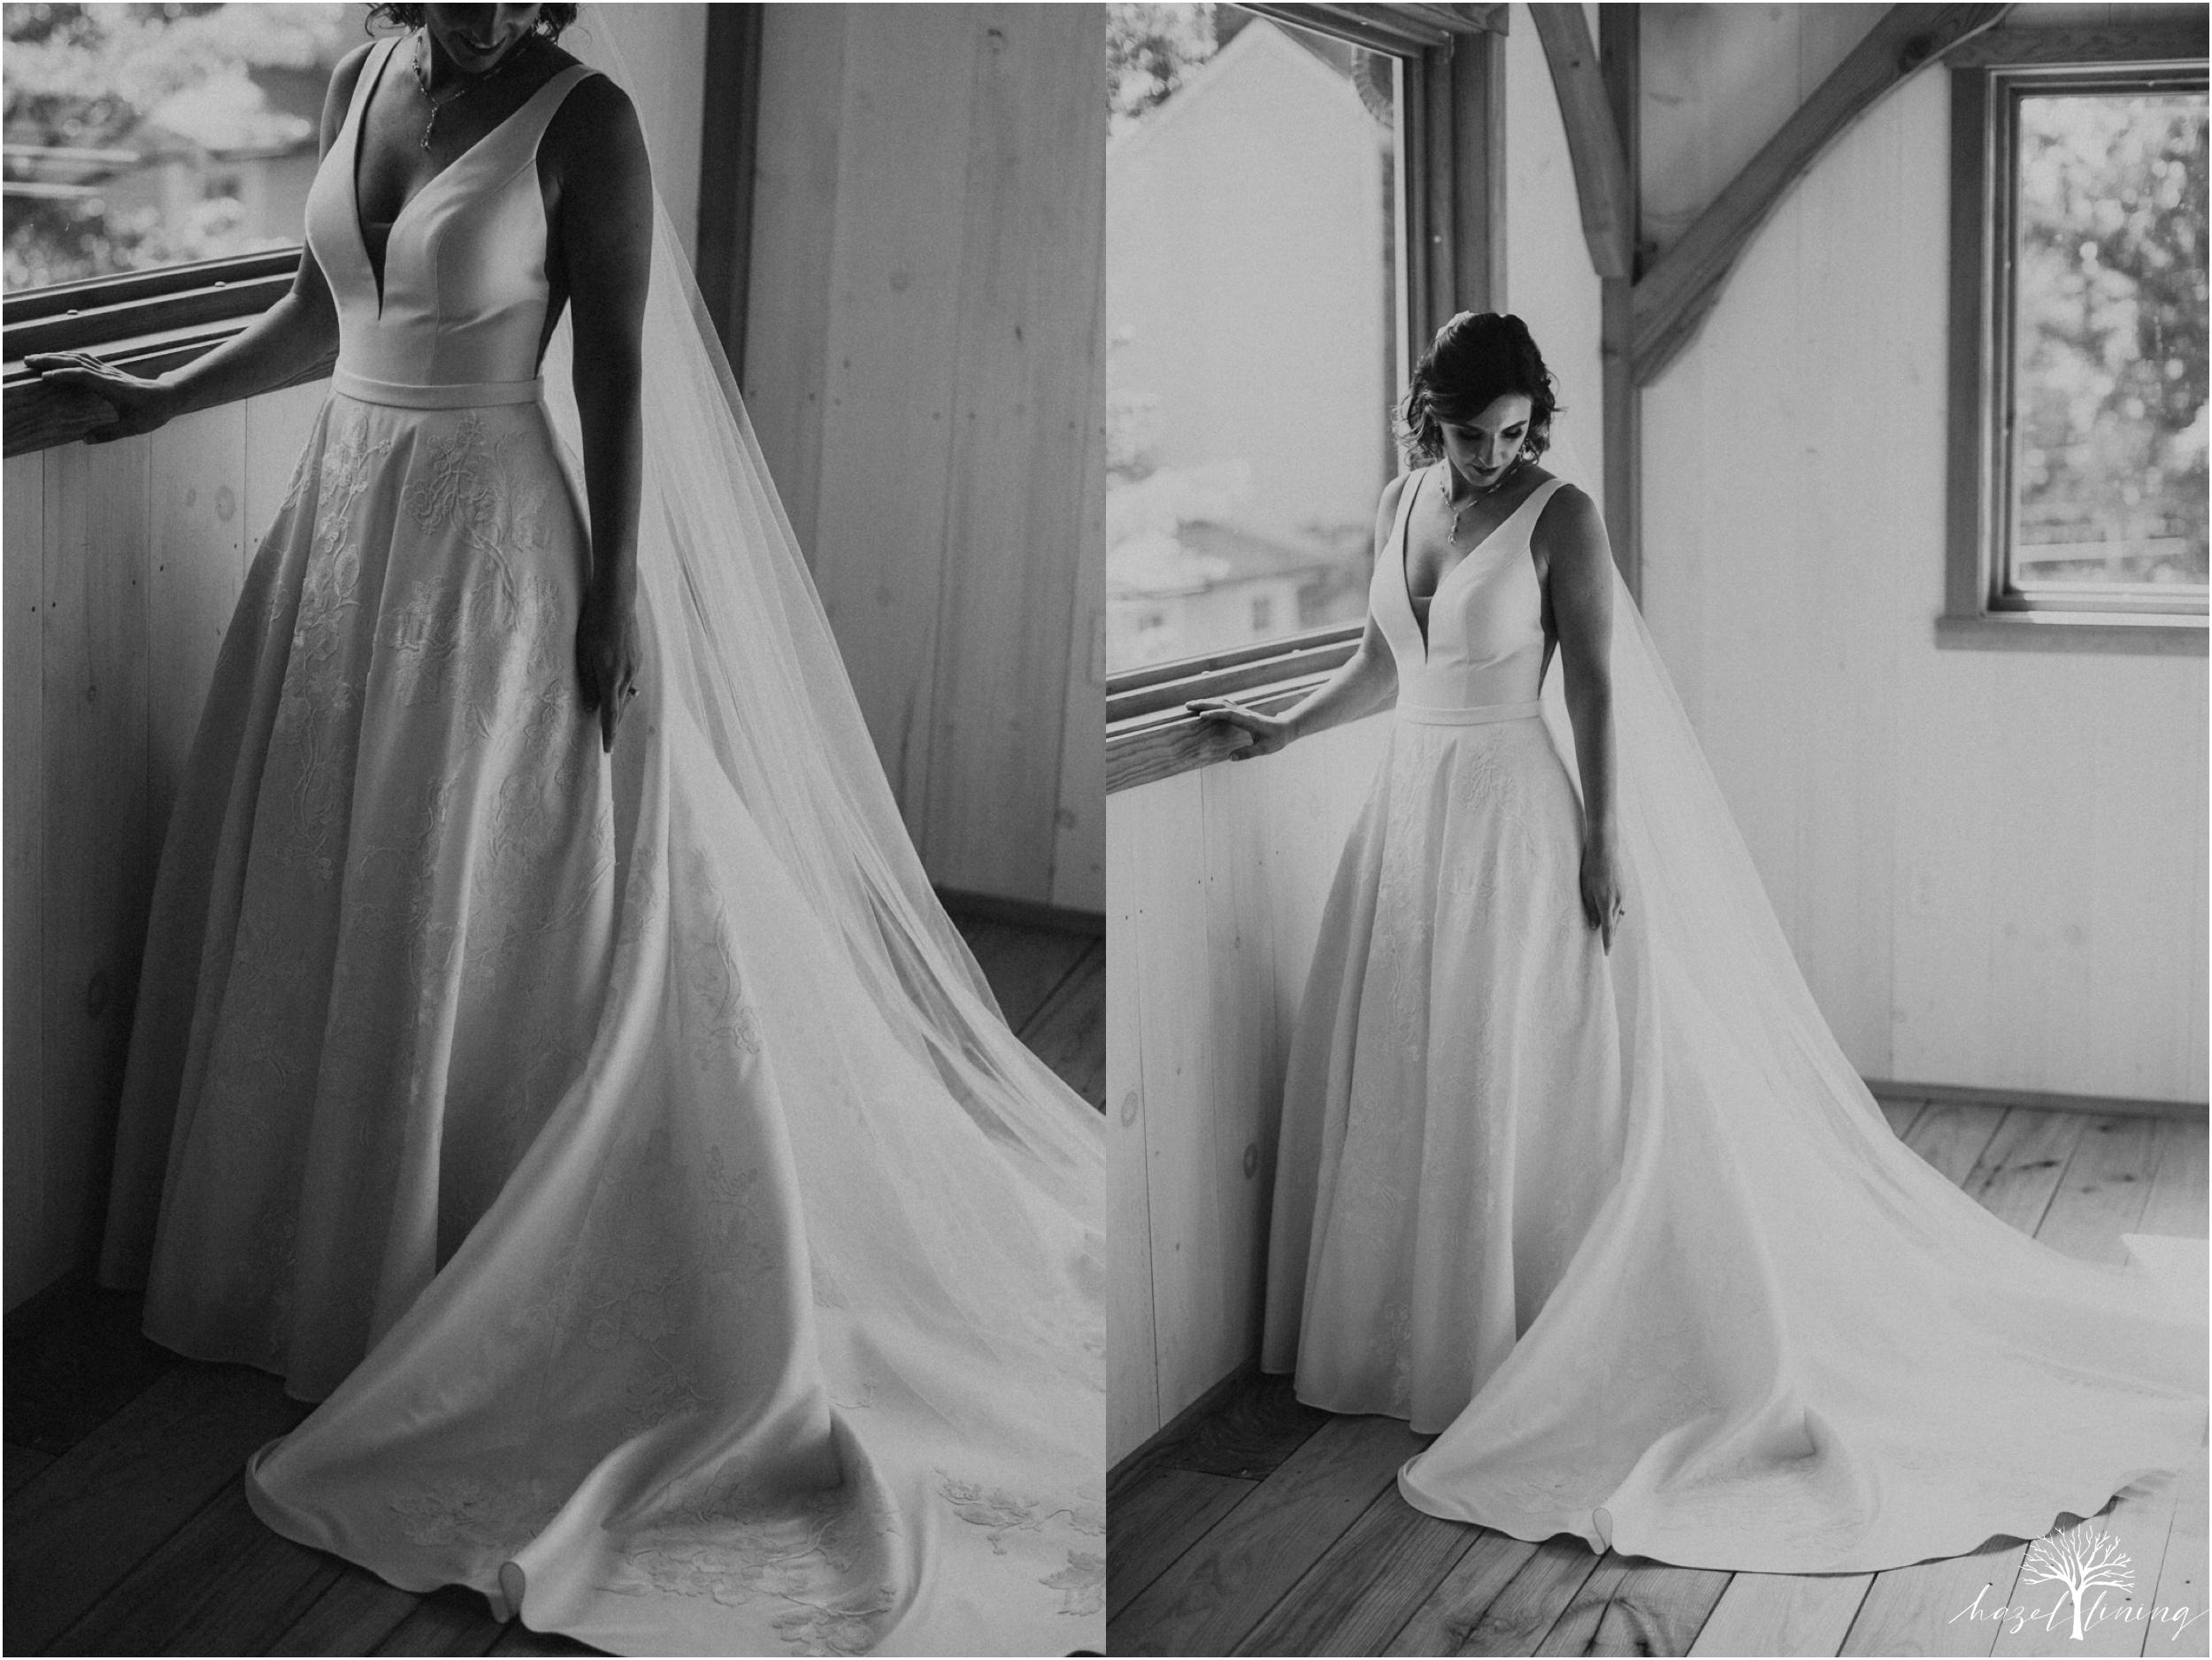 maureen-hepner-anthony-giordano-rose-bank-winery-newtow-pennsylvania-luxury-summer-wedding-hazel-lining-photography-destination-elopement-wedding-engagement-photography_0023.jpg